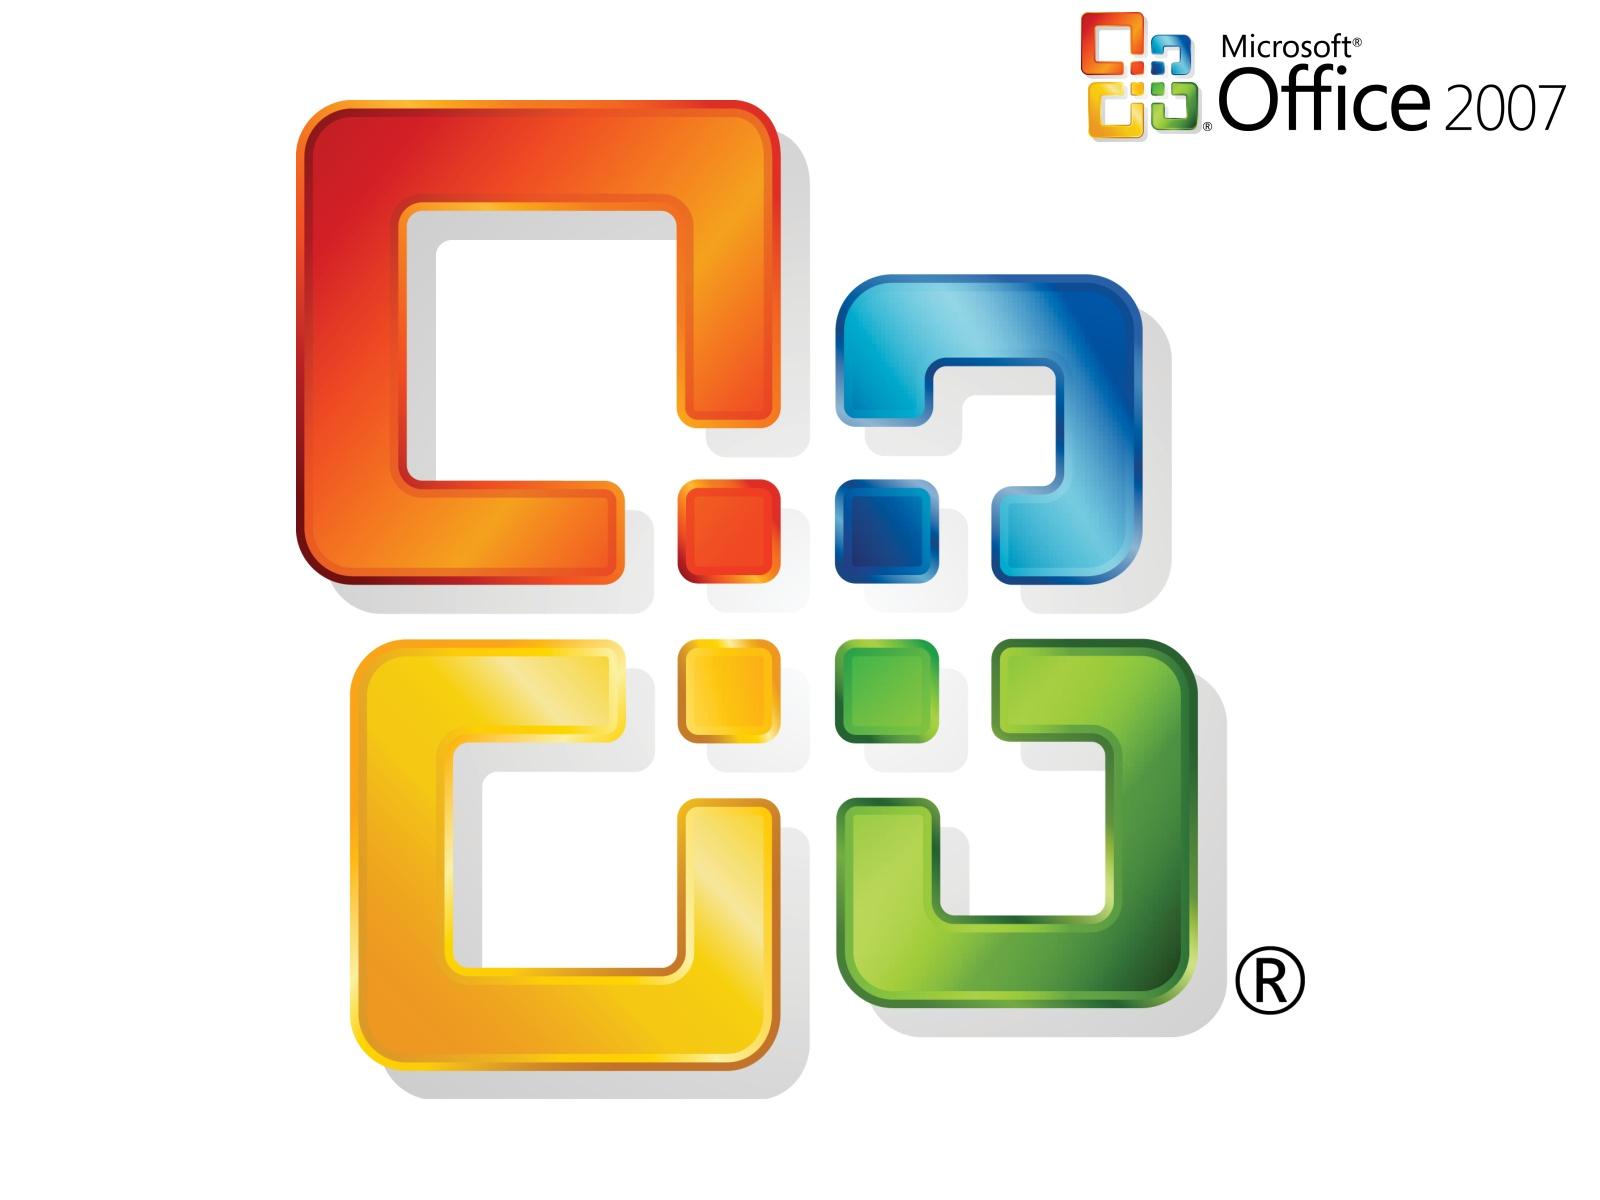 Microsoft Office 2007 - Office 2007 PNG HD - Microsoft Office PNG HD